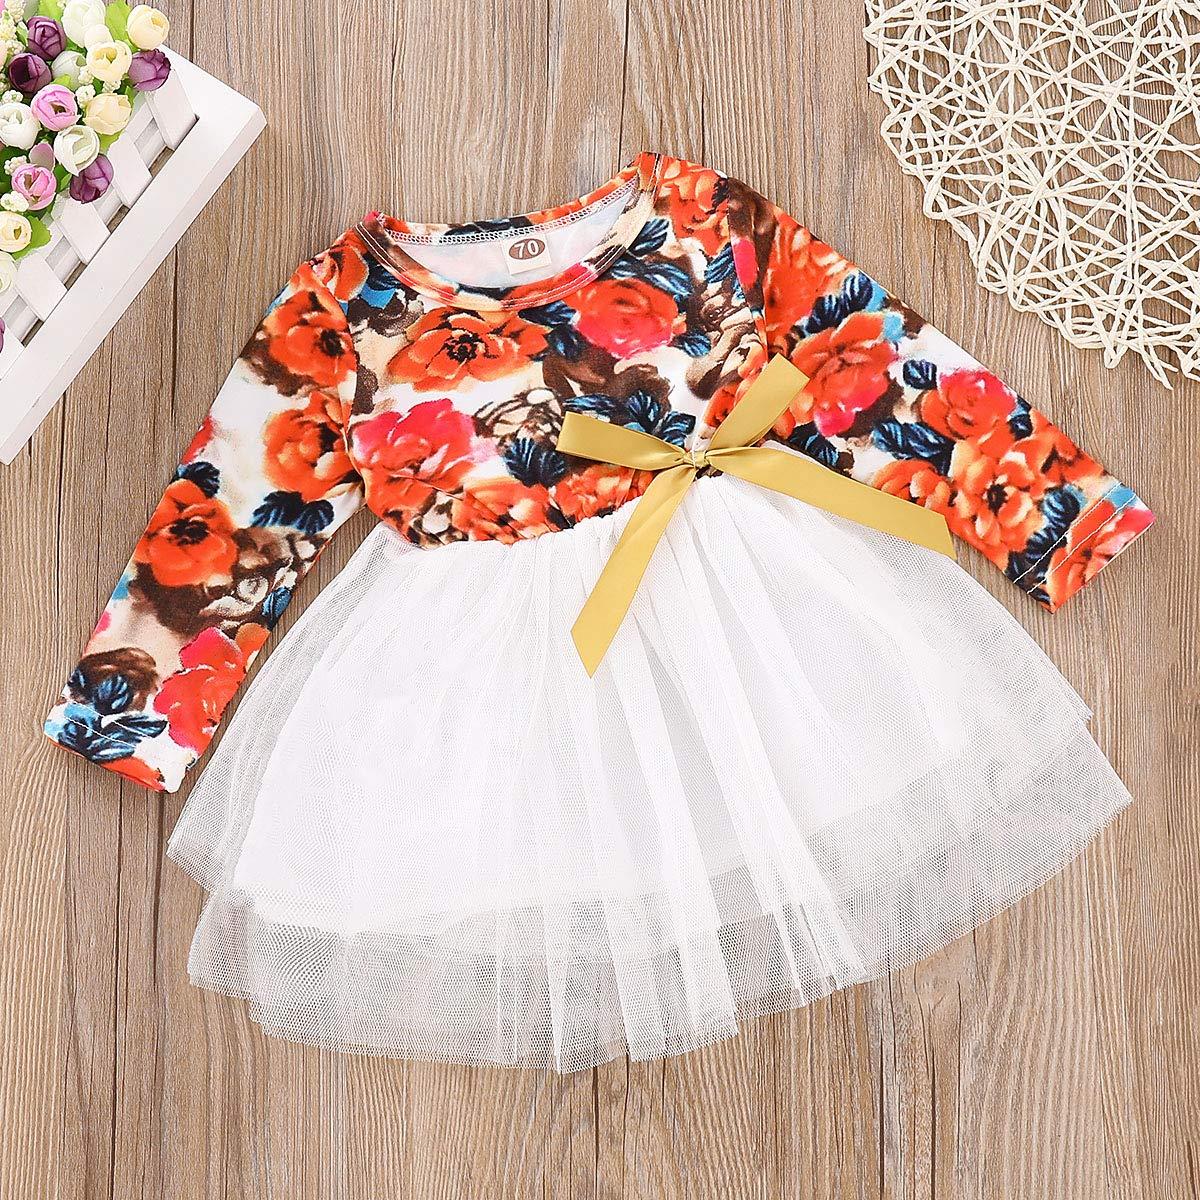 Flower Print + Tutu Skirt, 18-24 Months Tutu Skirt Set for Baby Girl Long Sleeve Flower Print Bowknot Tulle Dress Spring Autumn Clothes